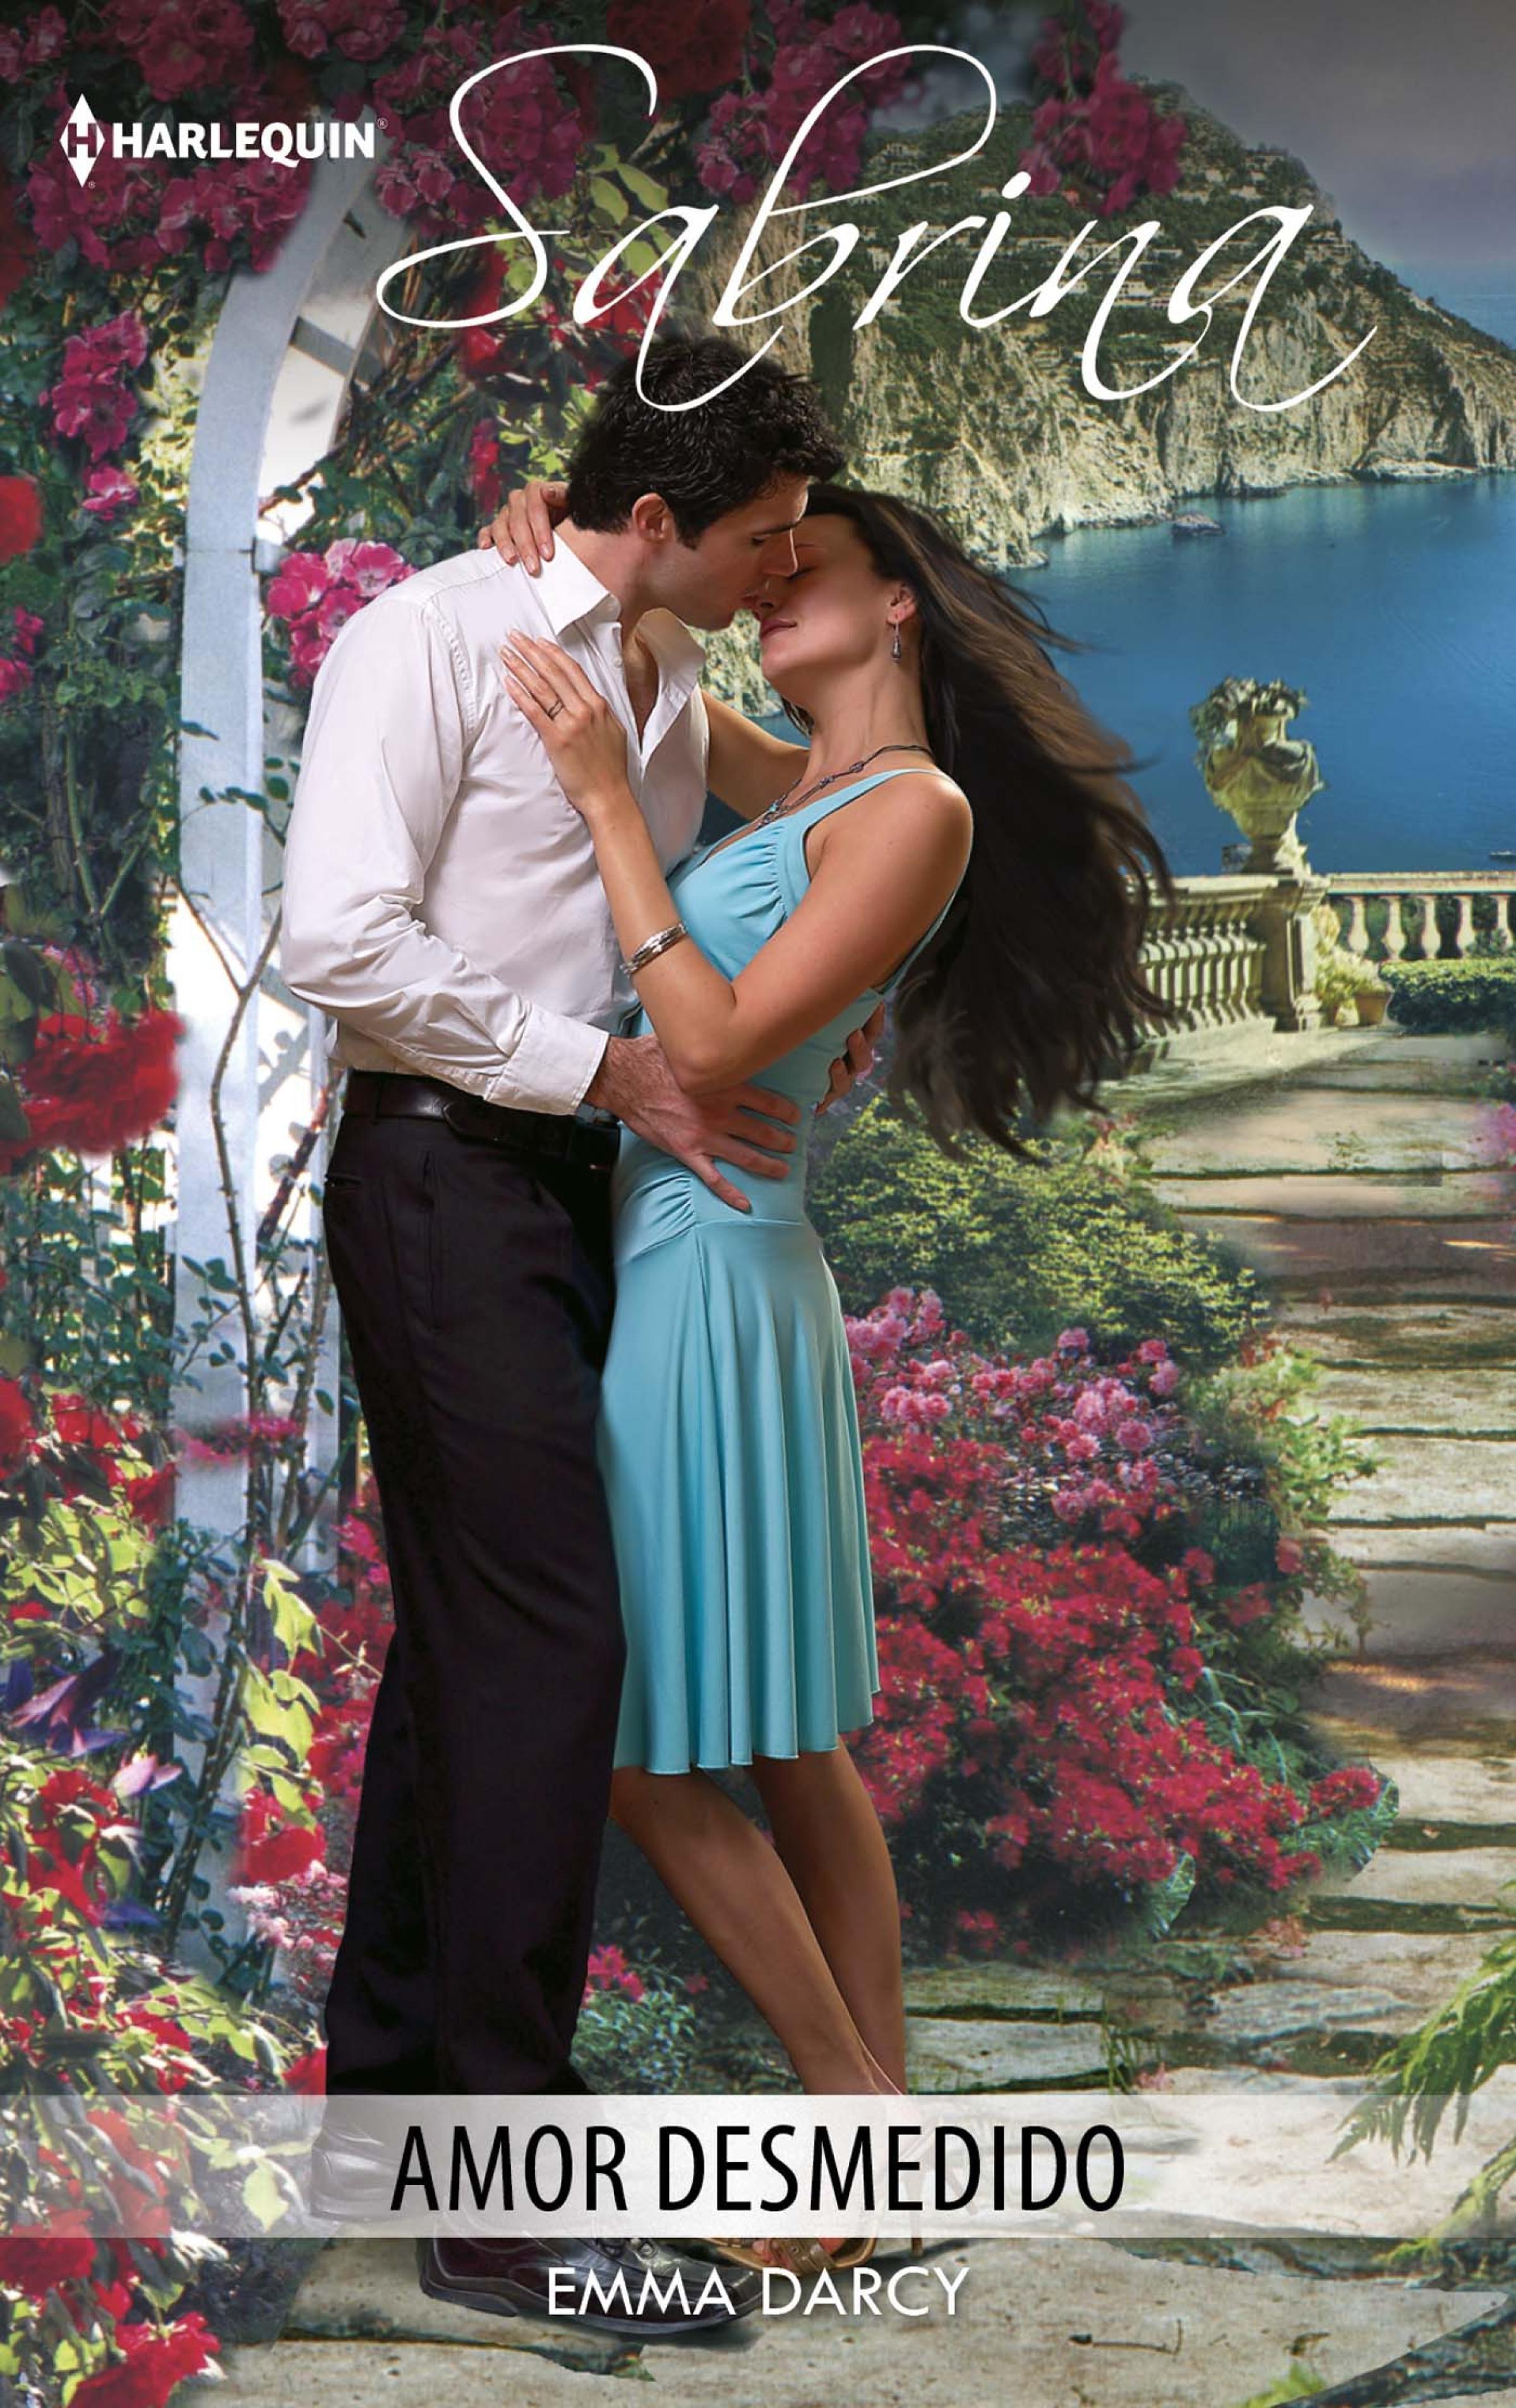 Emma Darcy Amor desmedido emma darcy the marriage decider